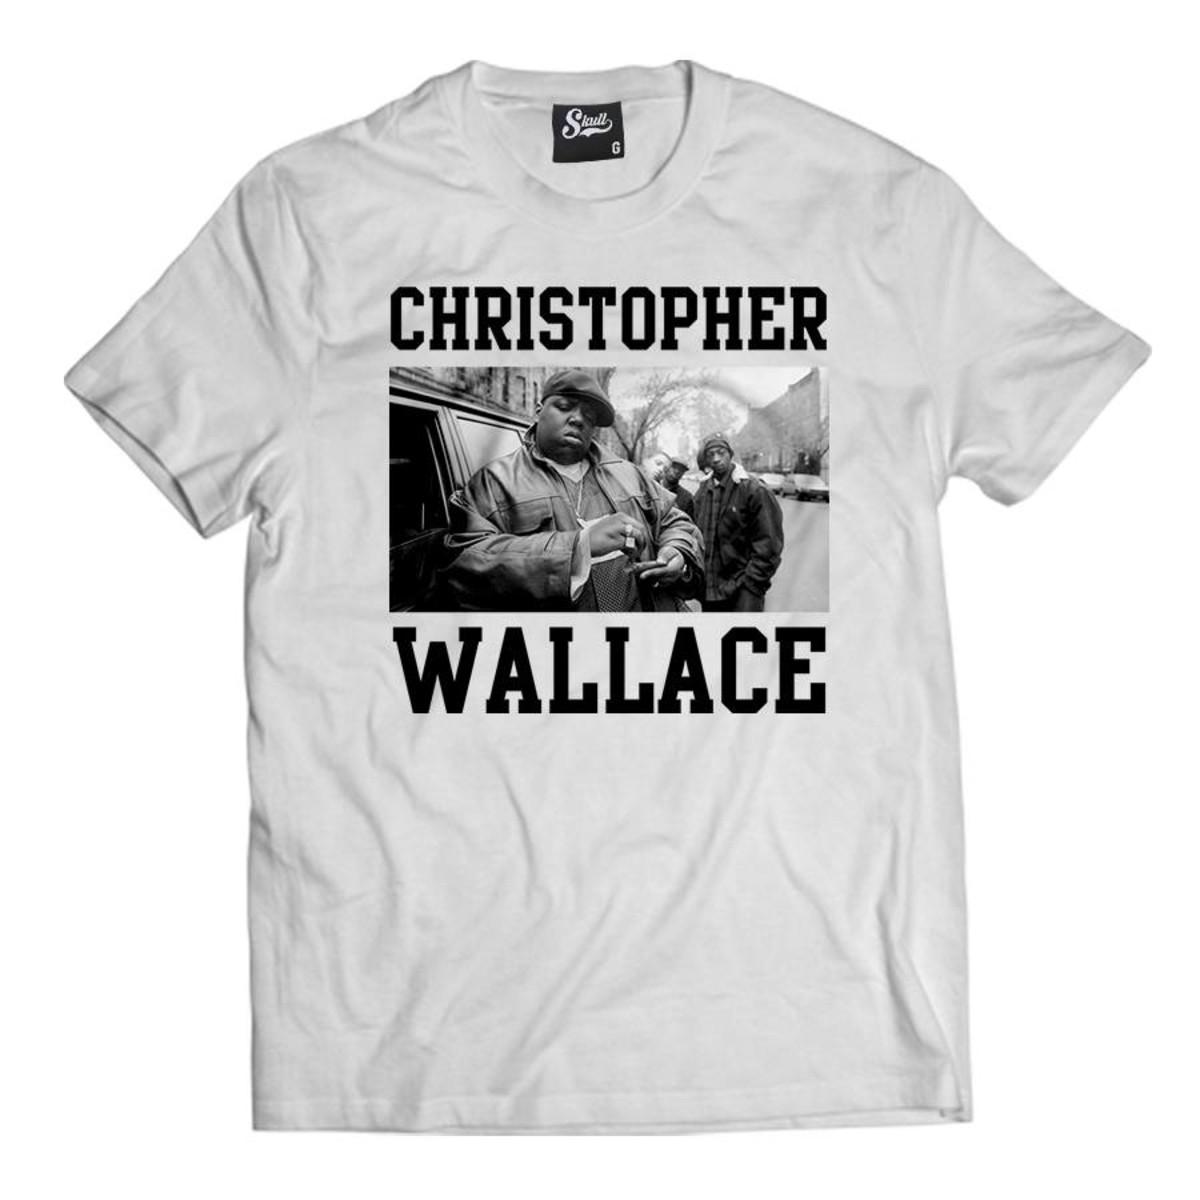 1c3b936caef78 Camiseta Christopher Wallace Camisa Masculina Notorious Big no Elo7 ...